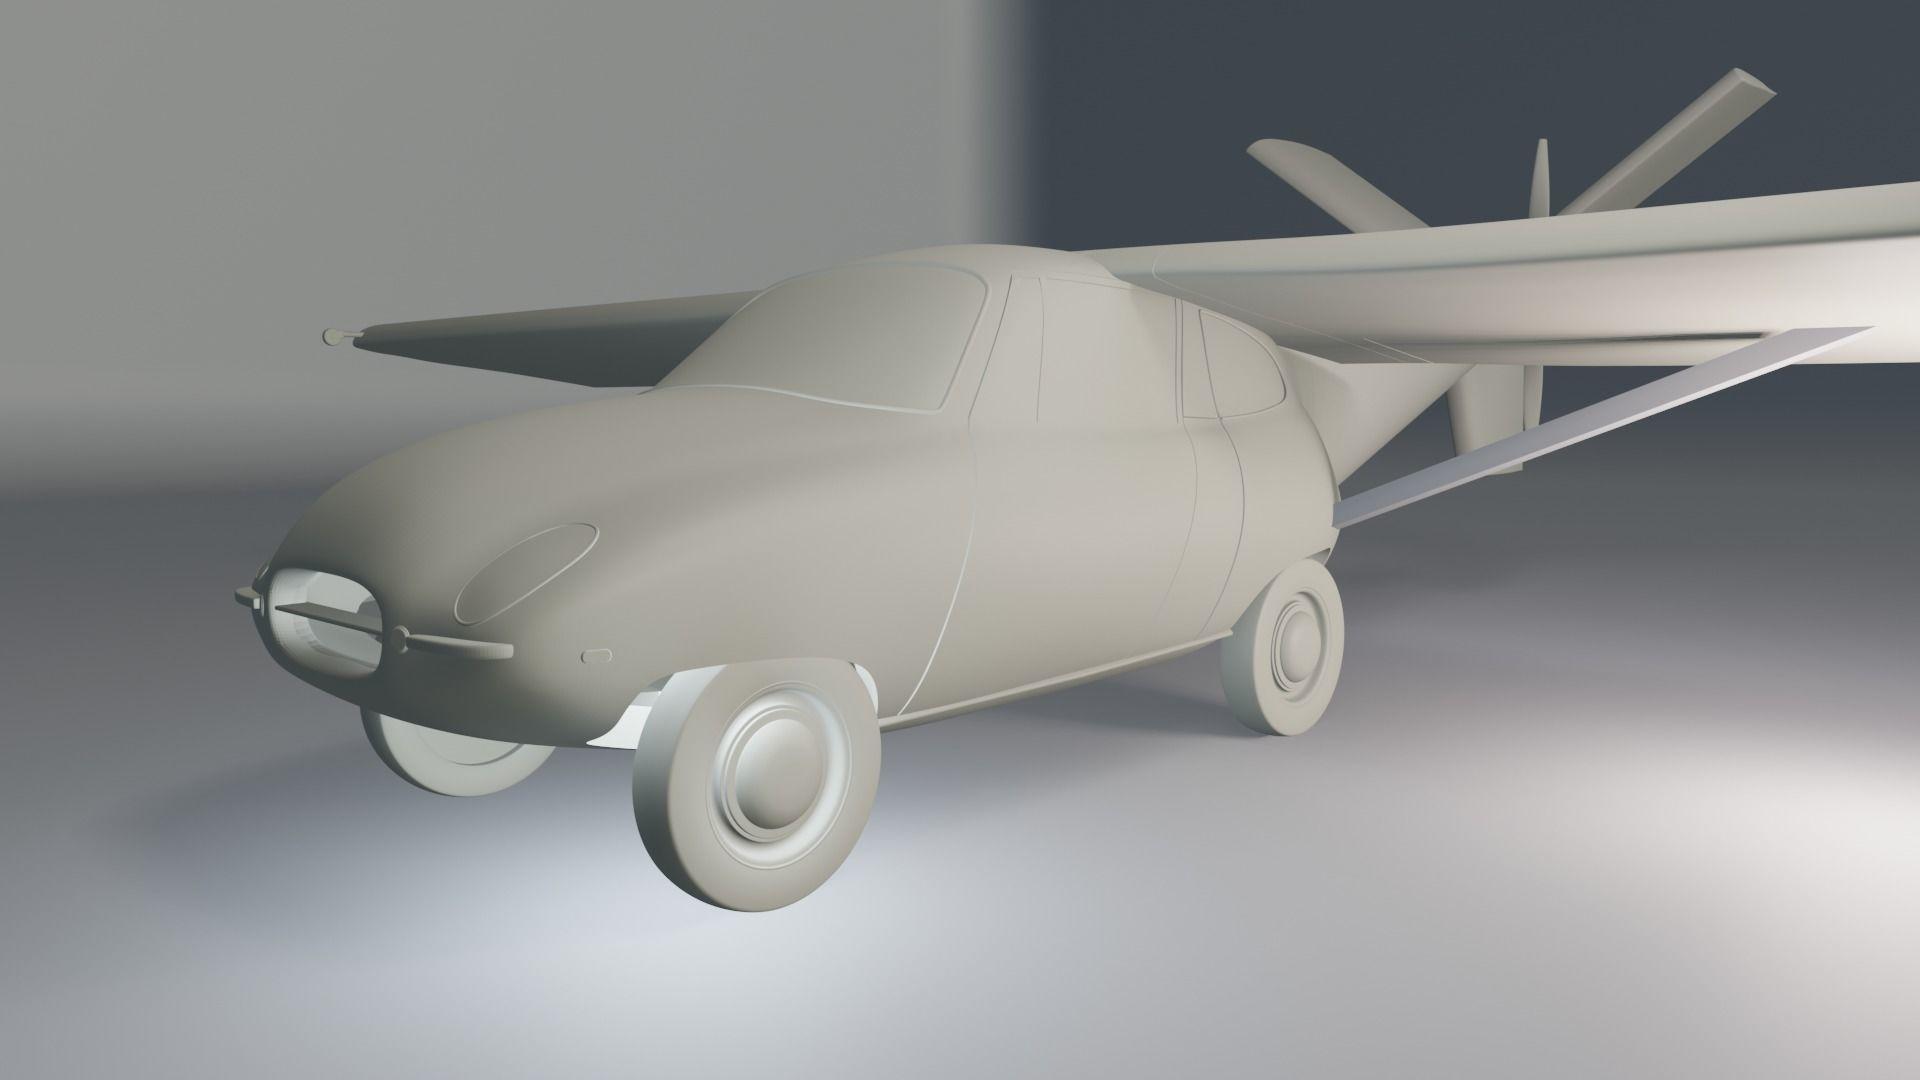 Aerocar III 3D Printable Model